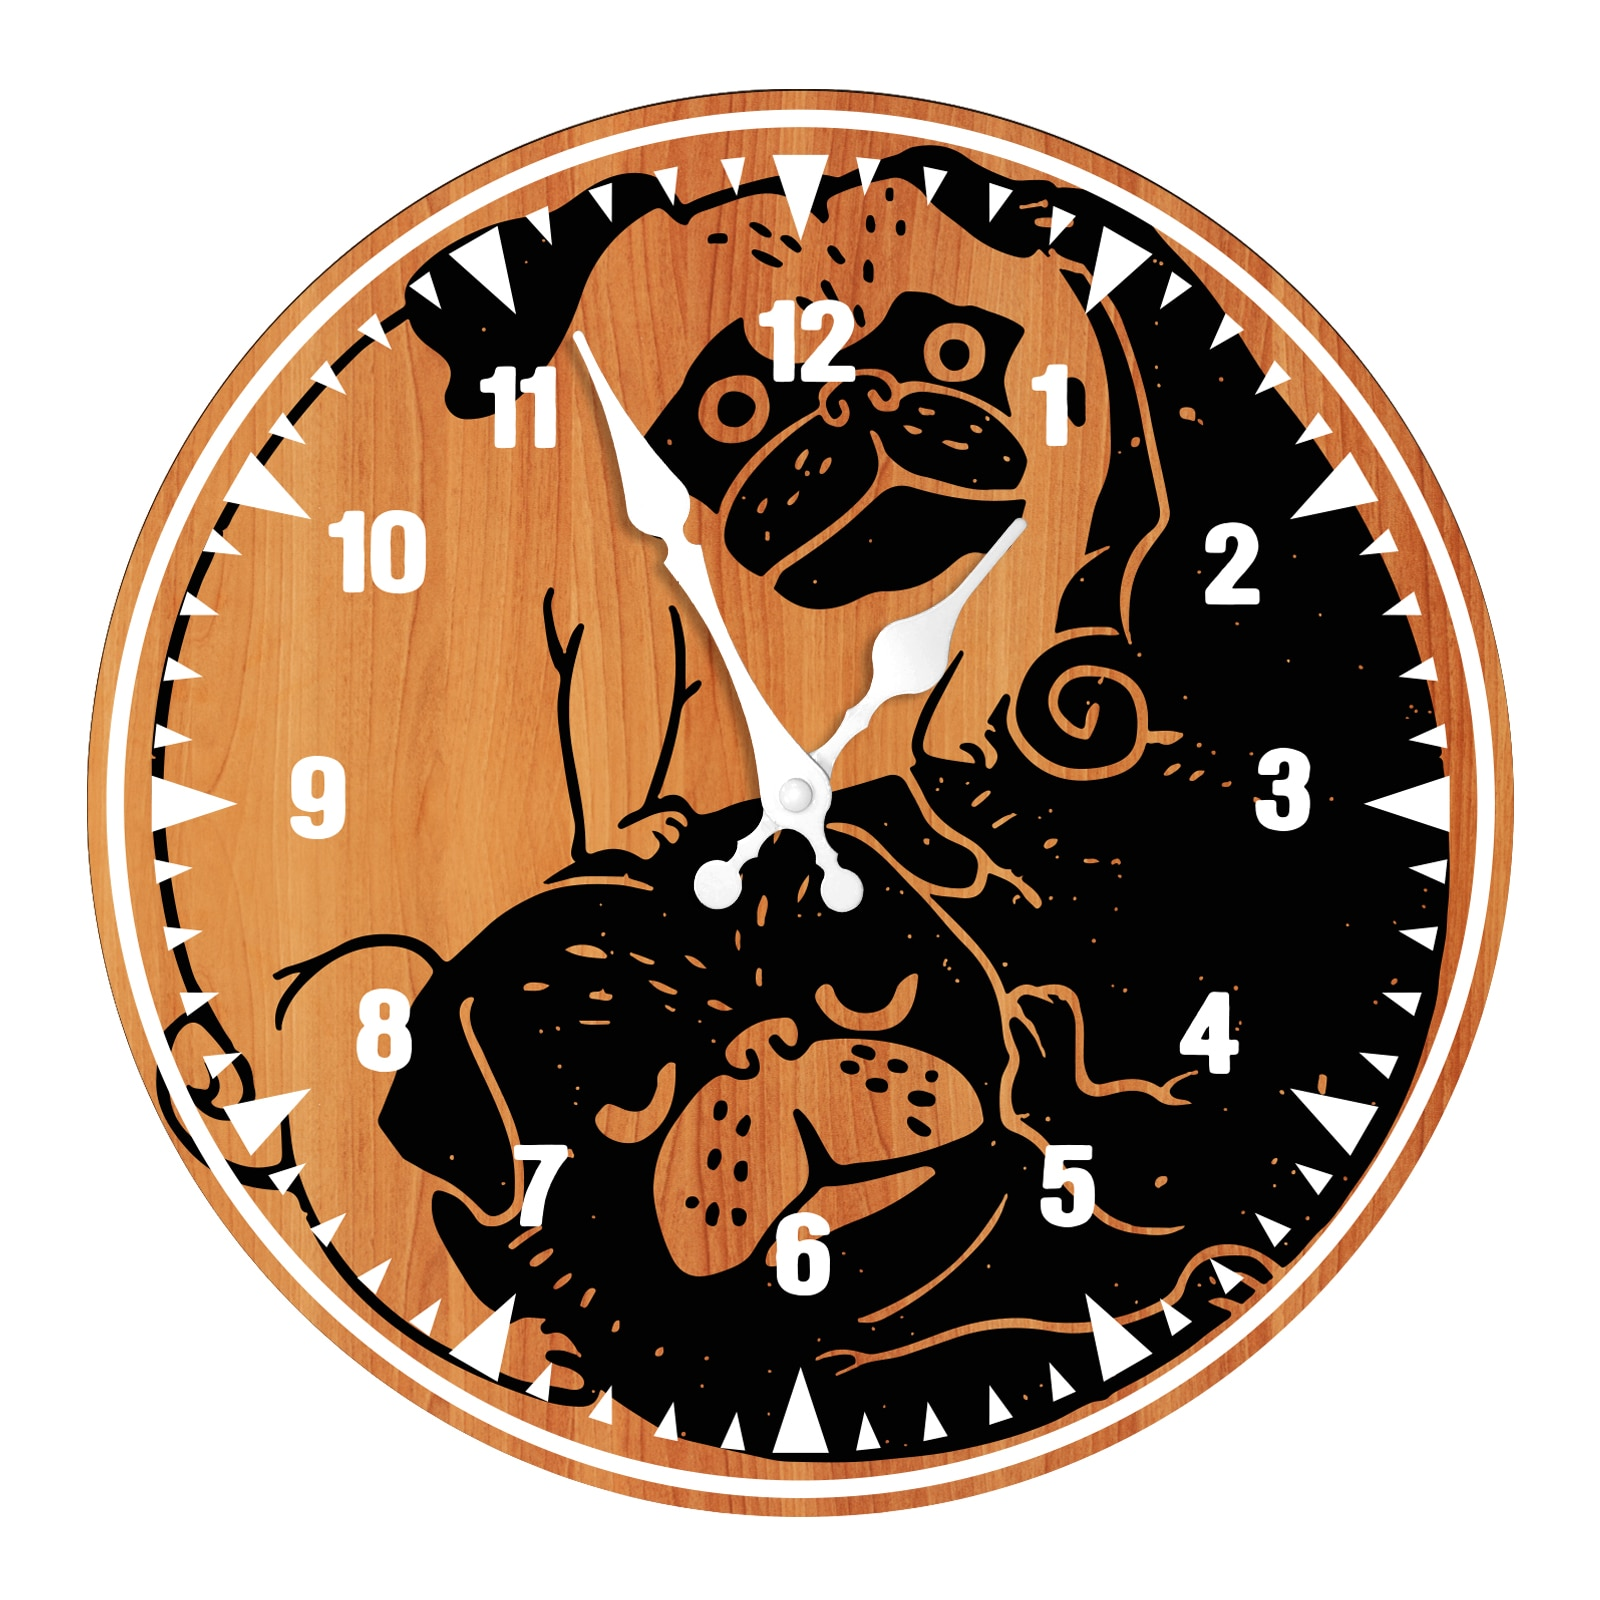 Retro Cartoon Dog Wooden Wall Clock Modern Design Decorative for Living Room Silent Non-Ticking Quartz Round Wood Wall Clock eiffel tower round wood analog wall clock